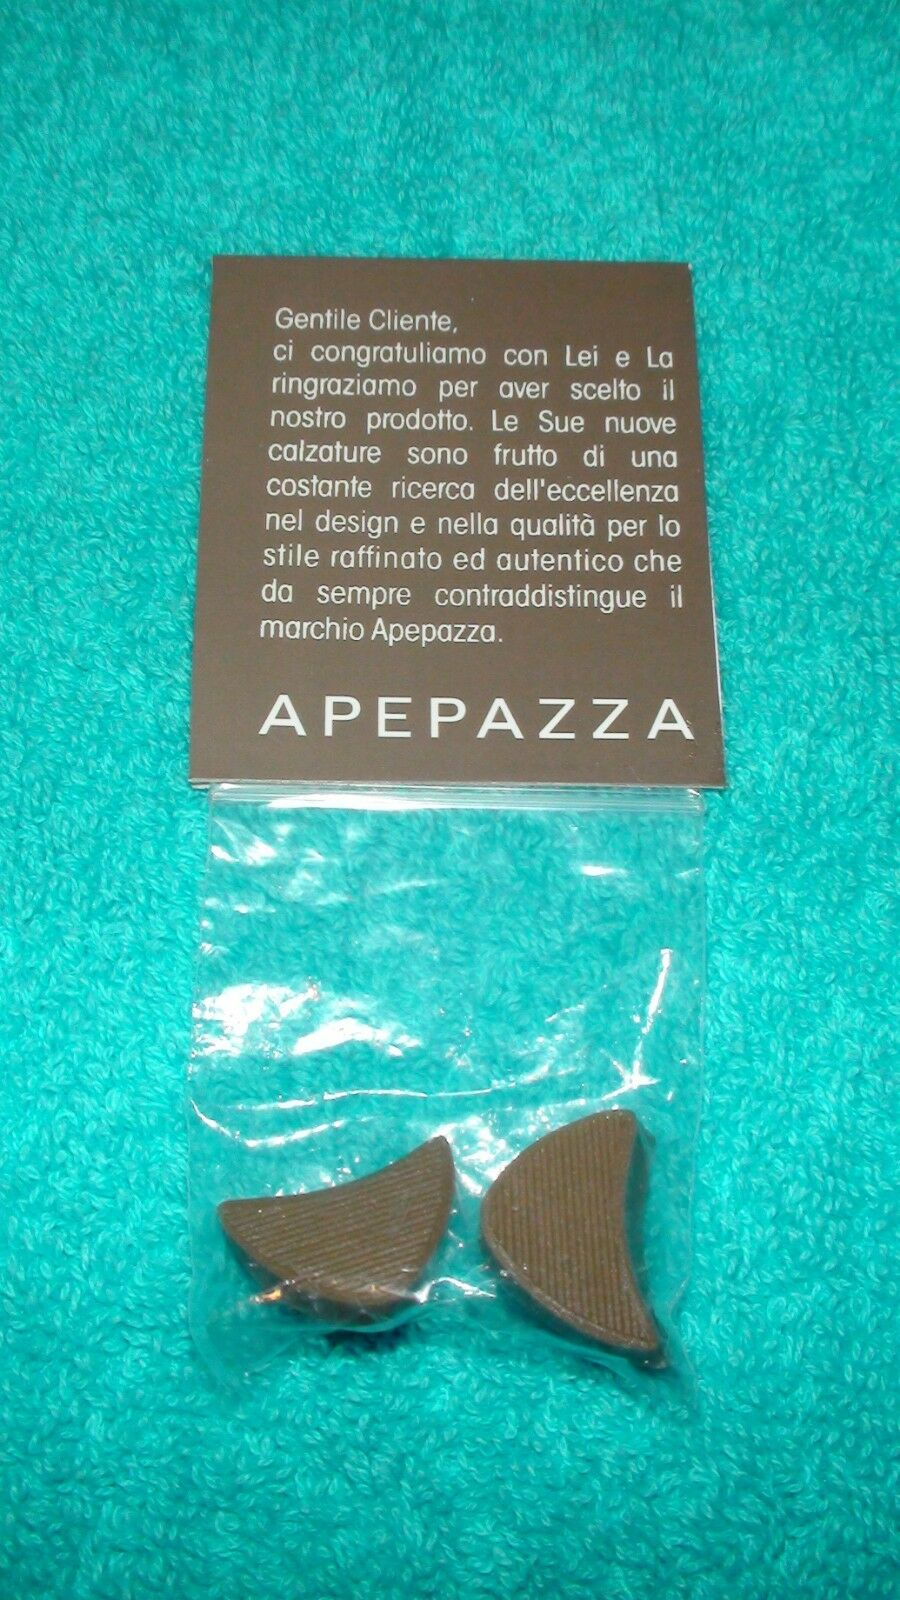 Apepazza Donna  Wedge Sandal nero376-6.5 USSynthetic USSynthetic USSynthetic Ruched JerseyN I B cf5894